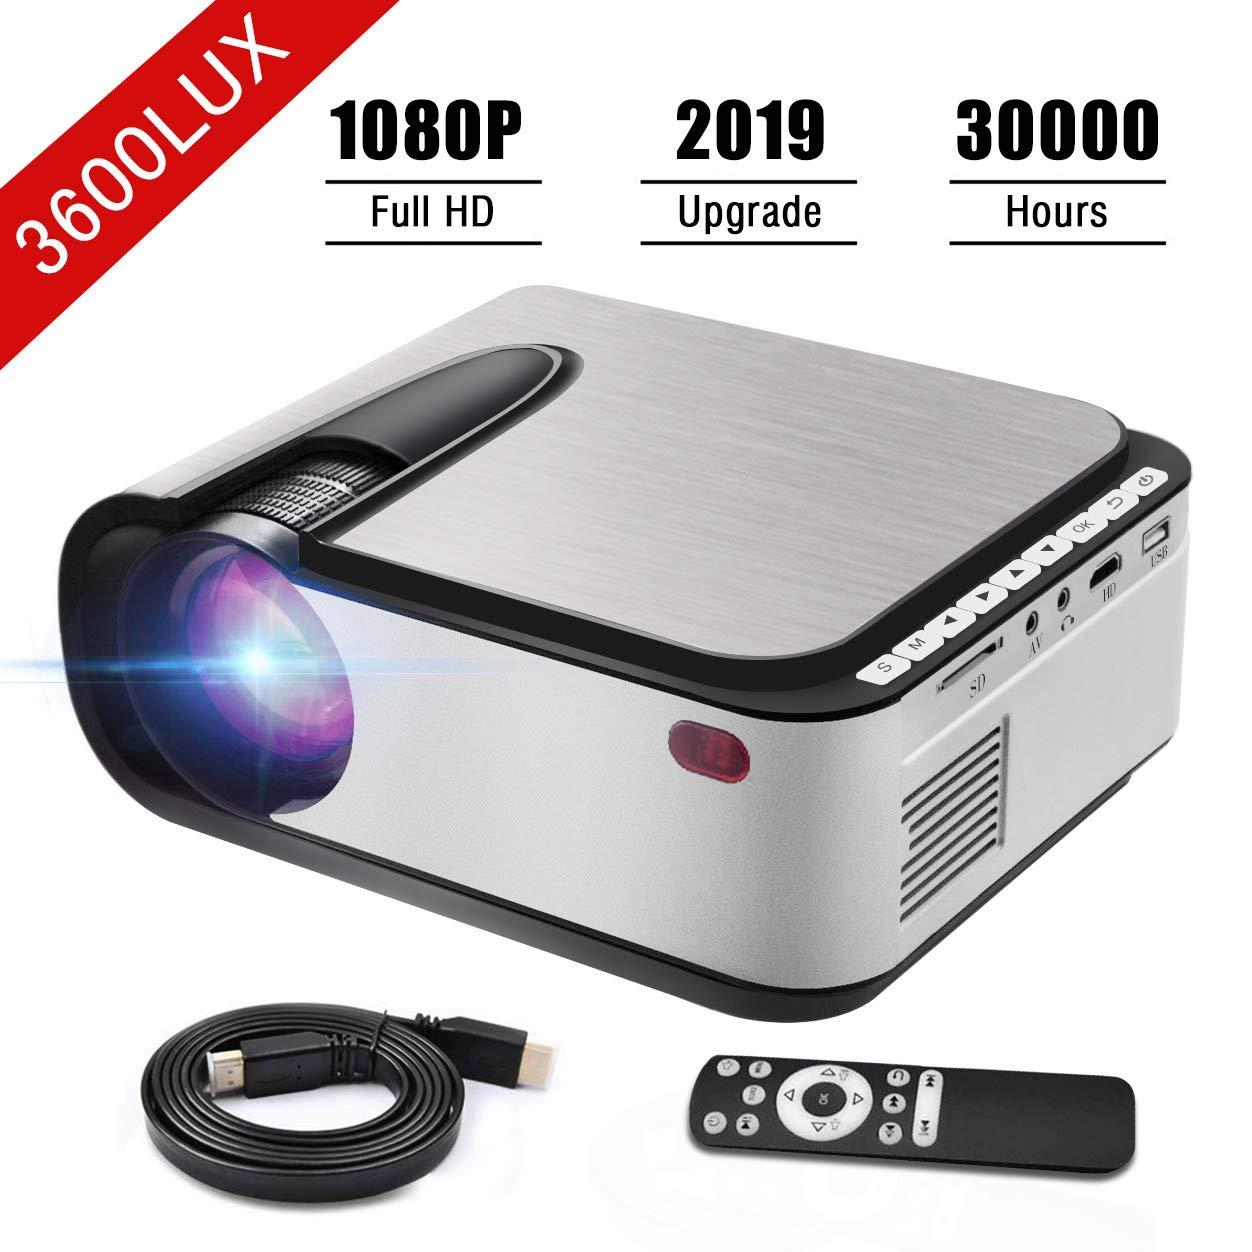 Projector Seeback Multimedia Theater Compatible